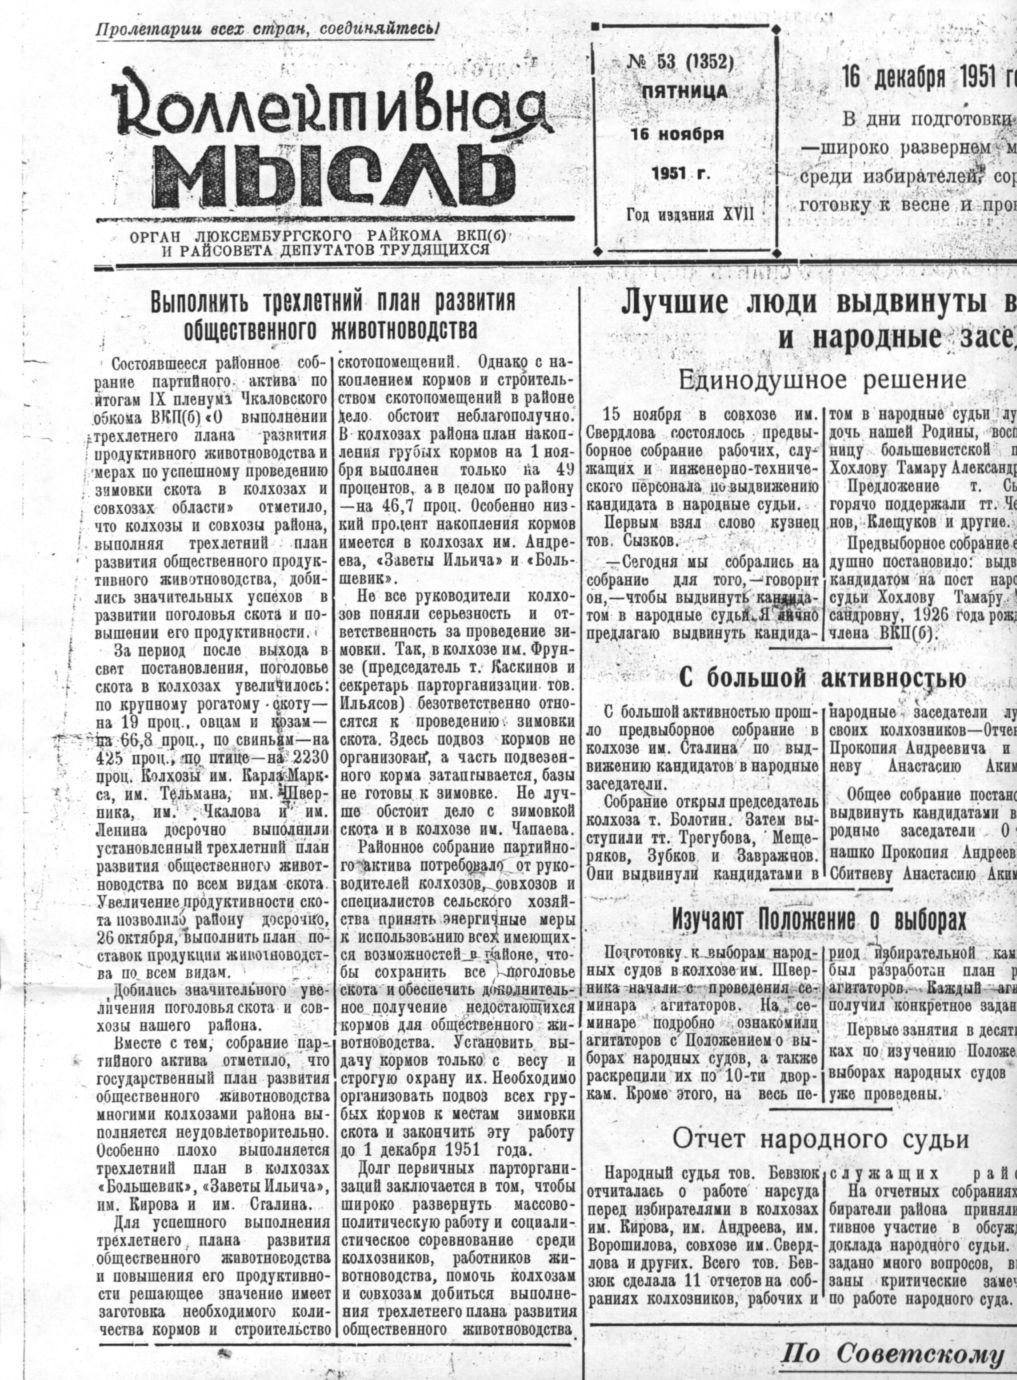 Mysl Russian Version 114